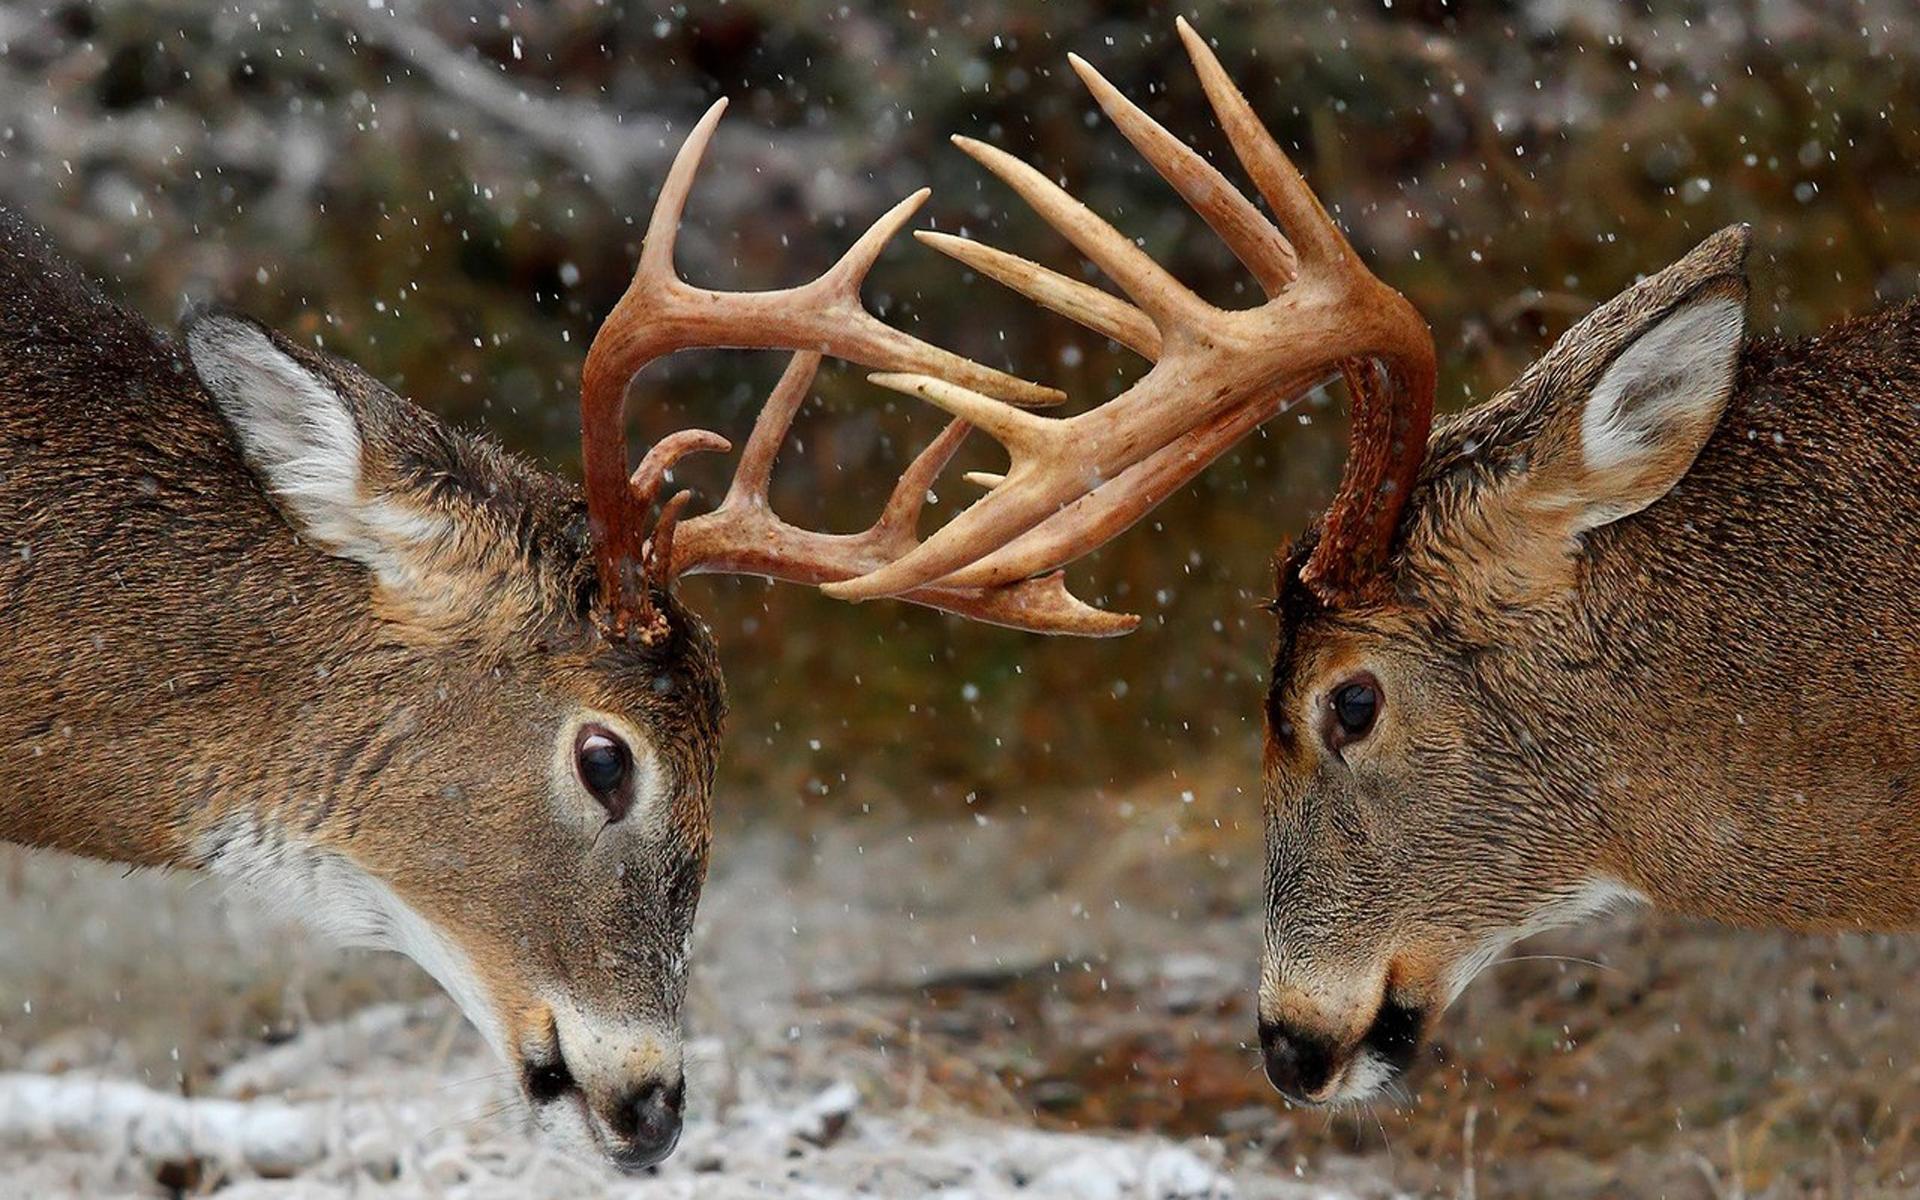 Whitetail Deer Wallpaper For Computer